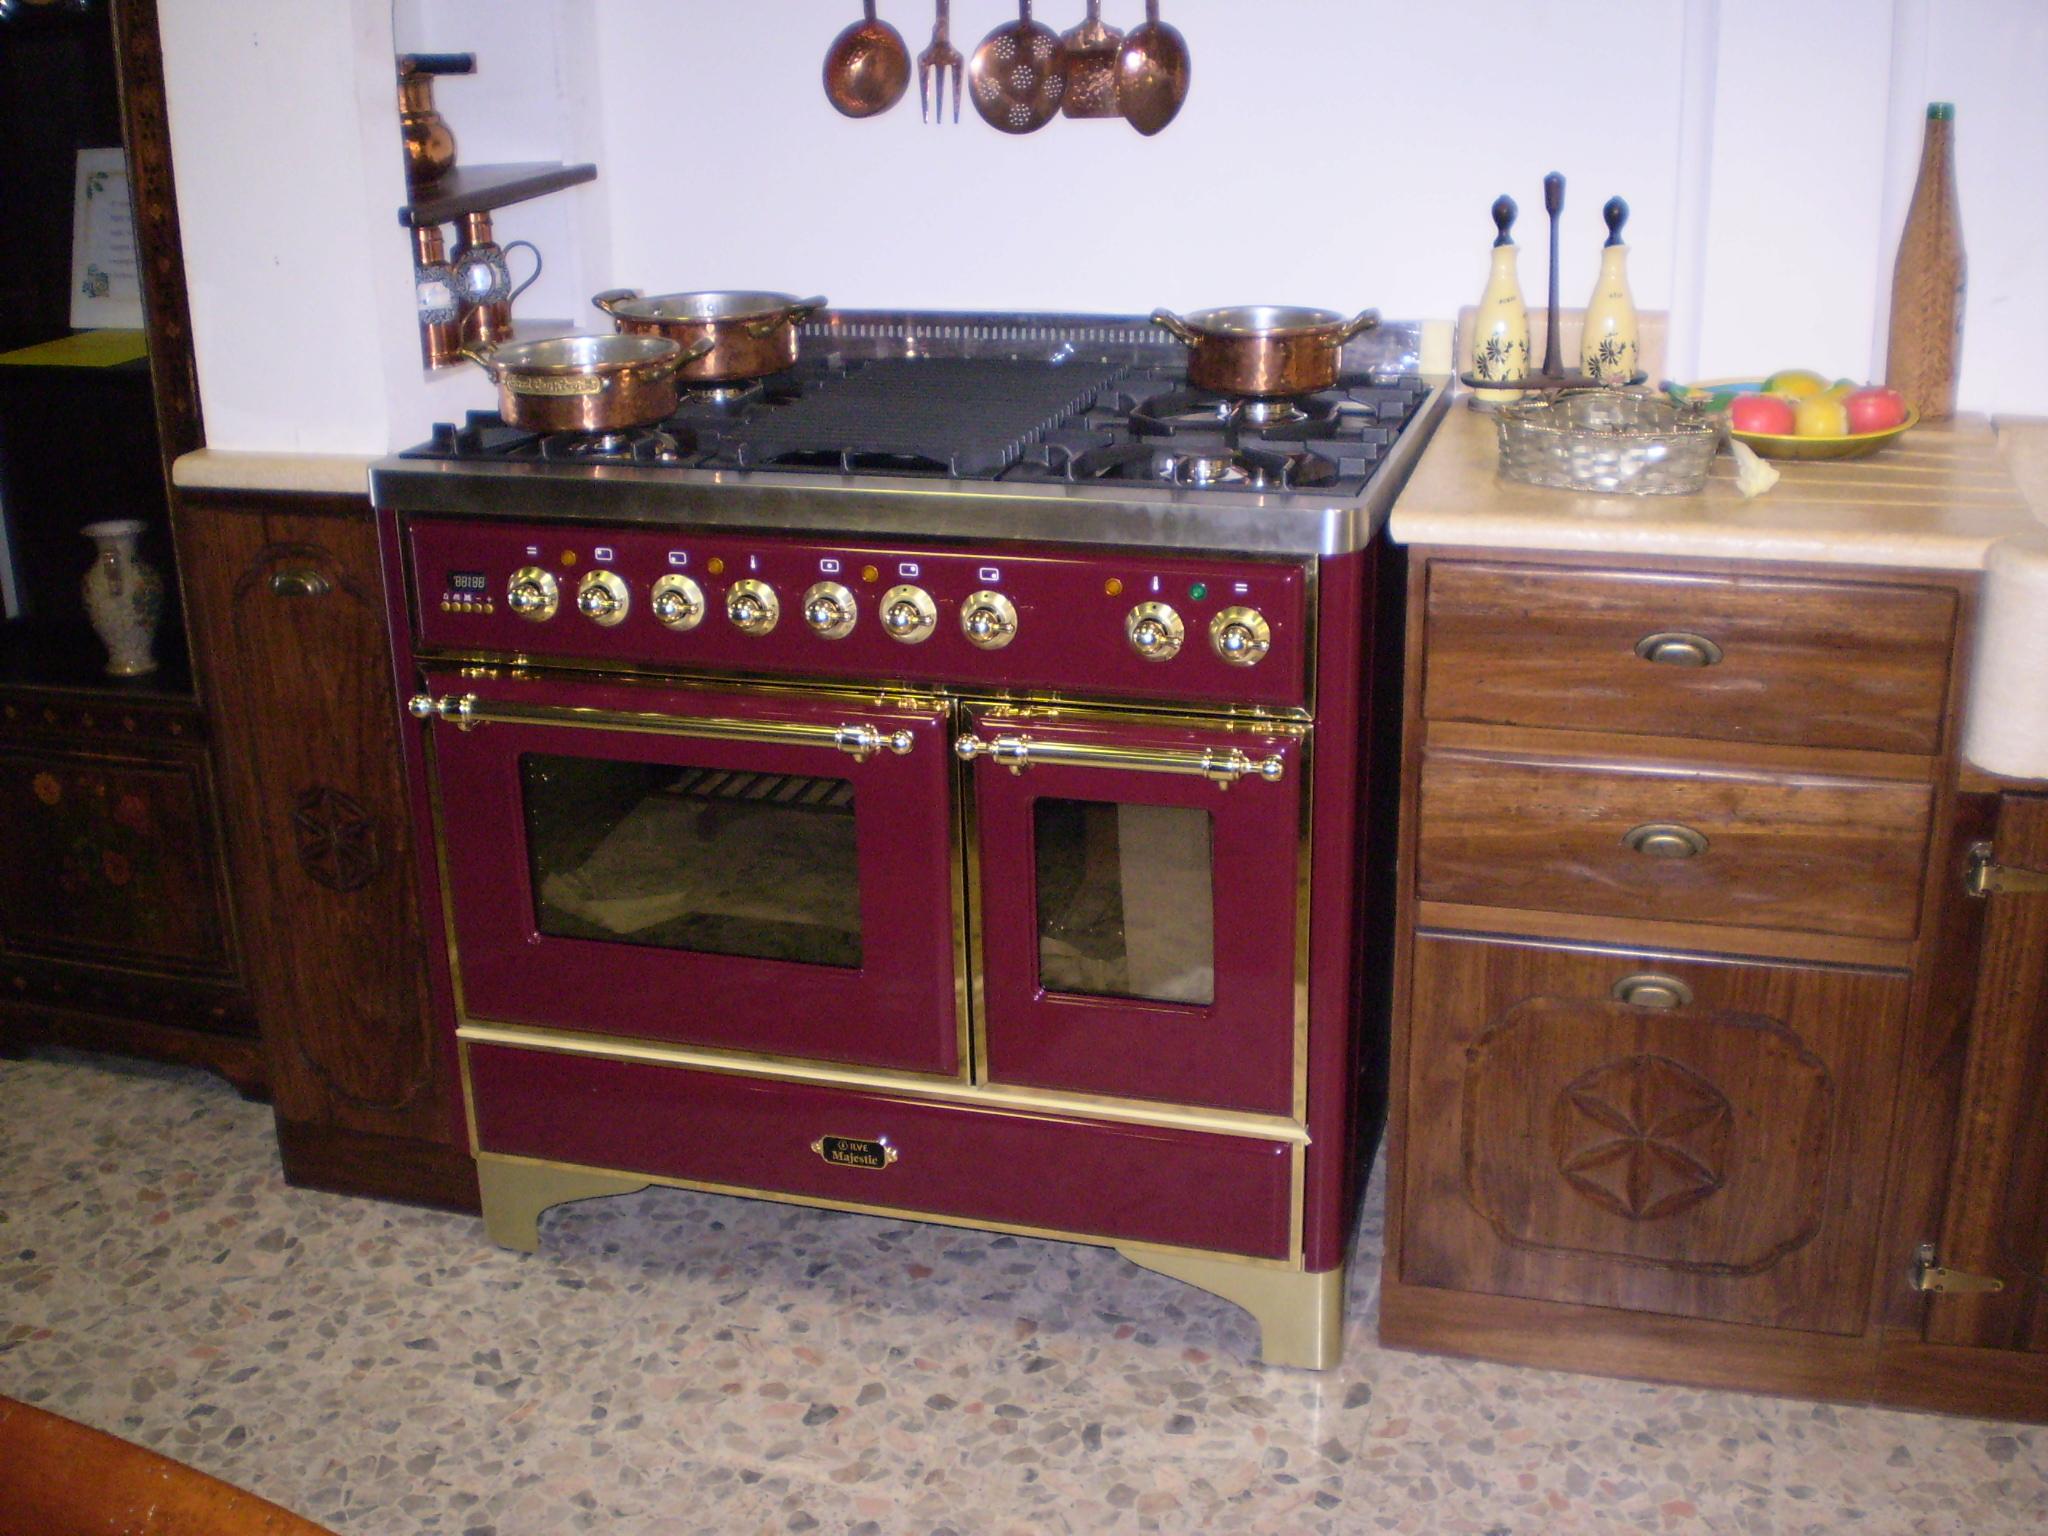 piano de cuisson pas cher elegant piano de cuisson gaz essentielb emcg n with piano de cuisson. Black Bedroom Furniture Sets. Home Design Ideas